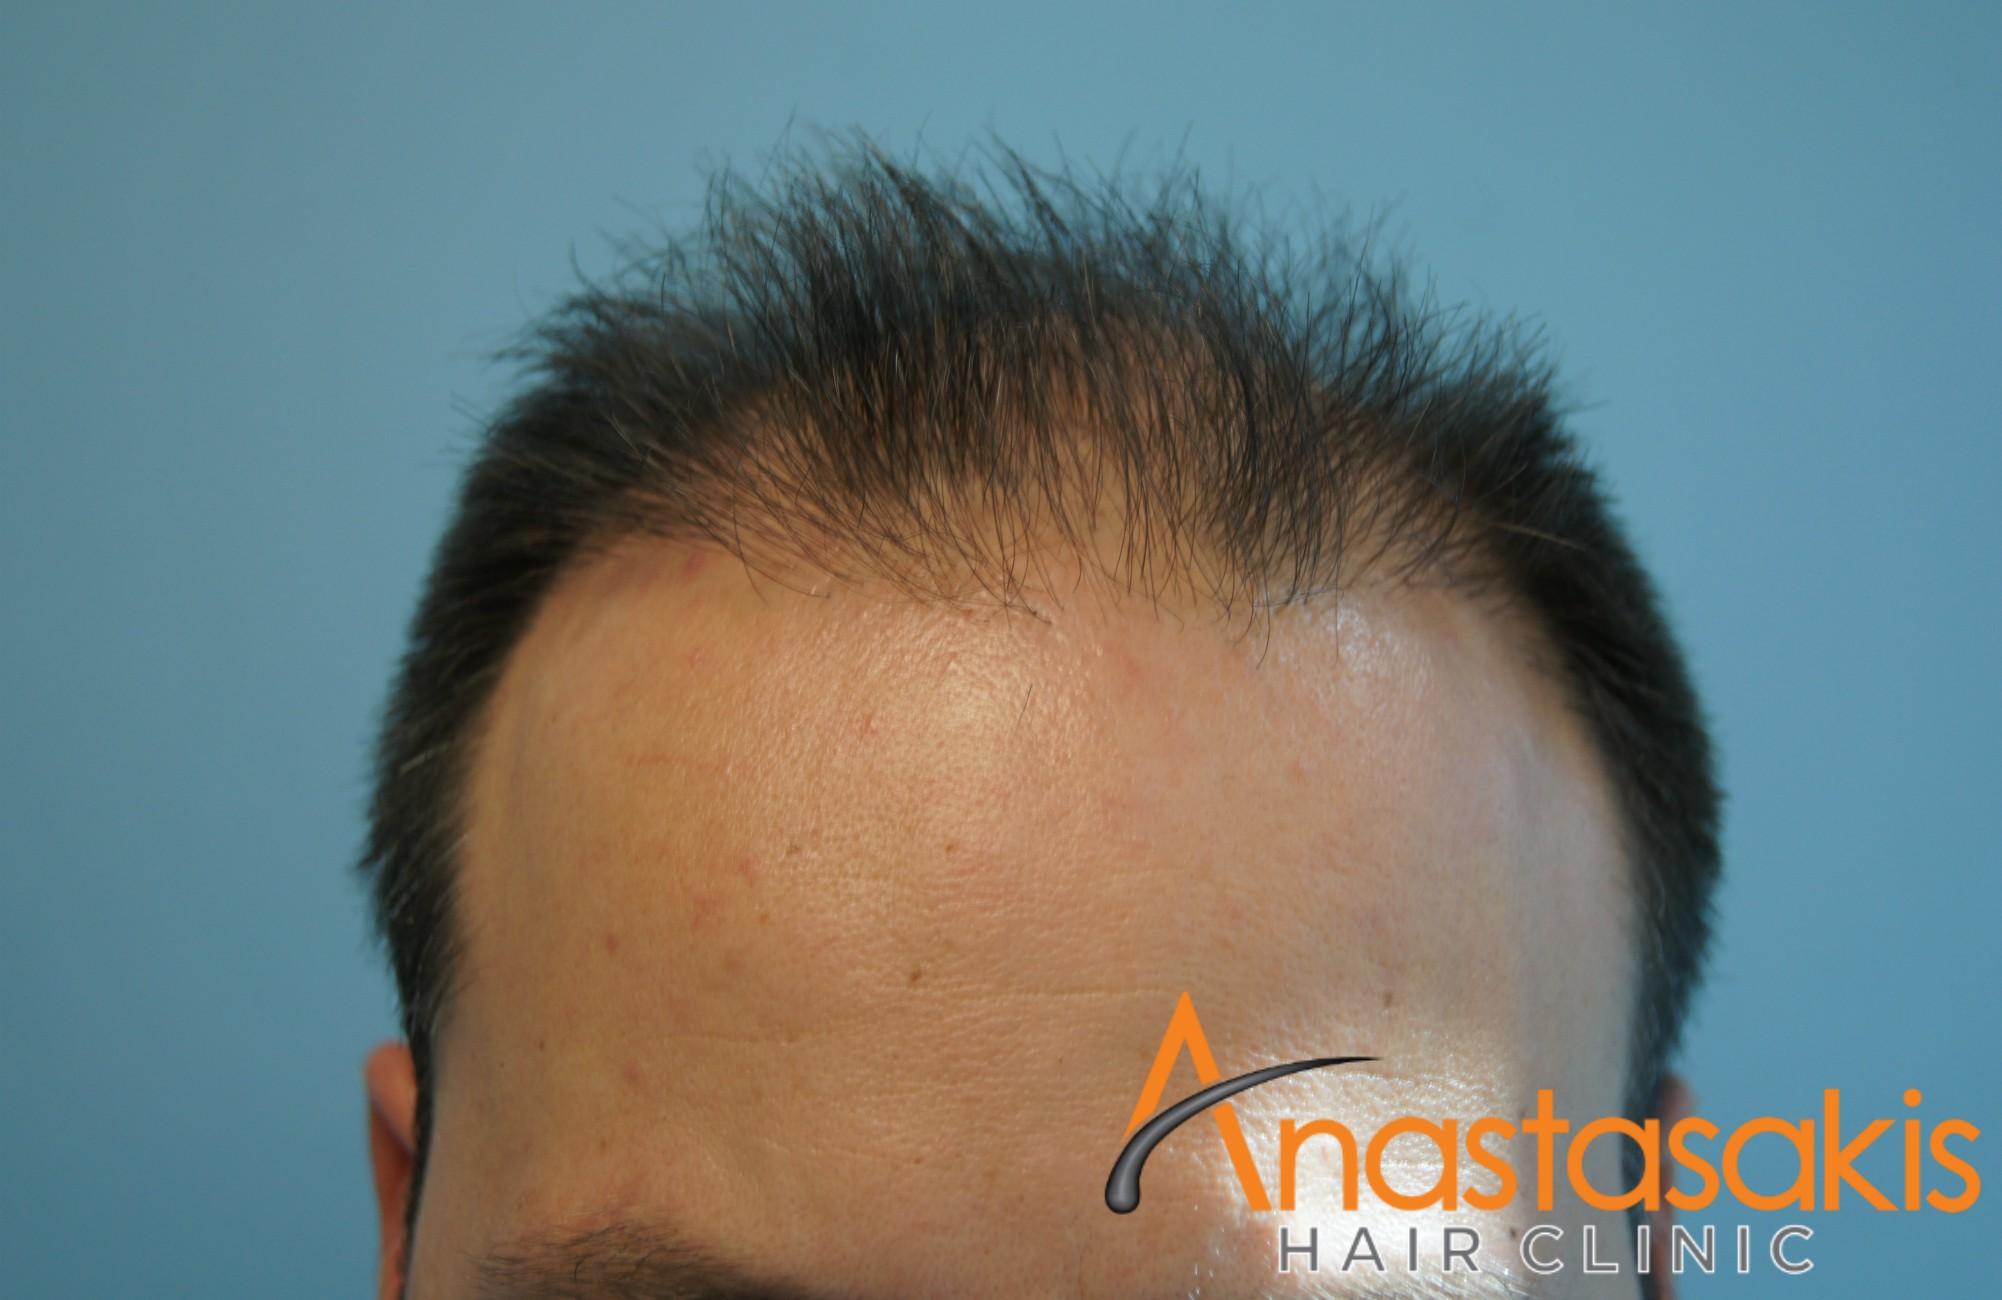 hairline βαγγελη μαρουση πριν τη μεταμοσχευση μαλλιων με 2500 fus